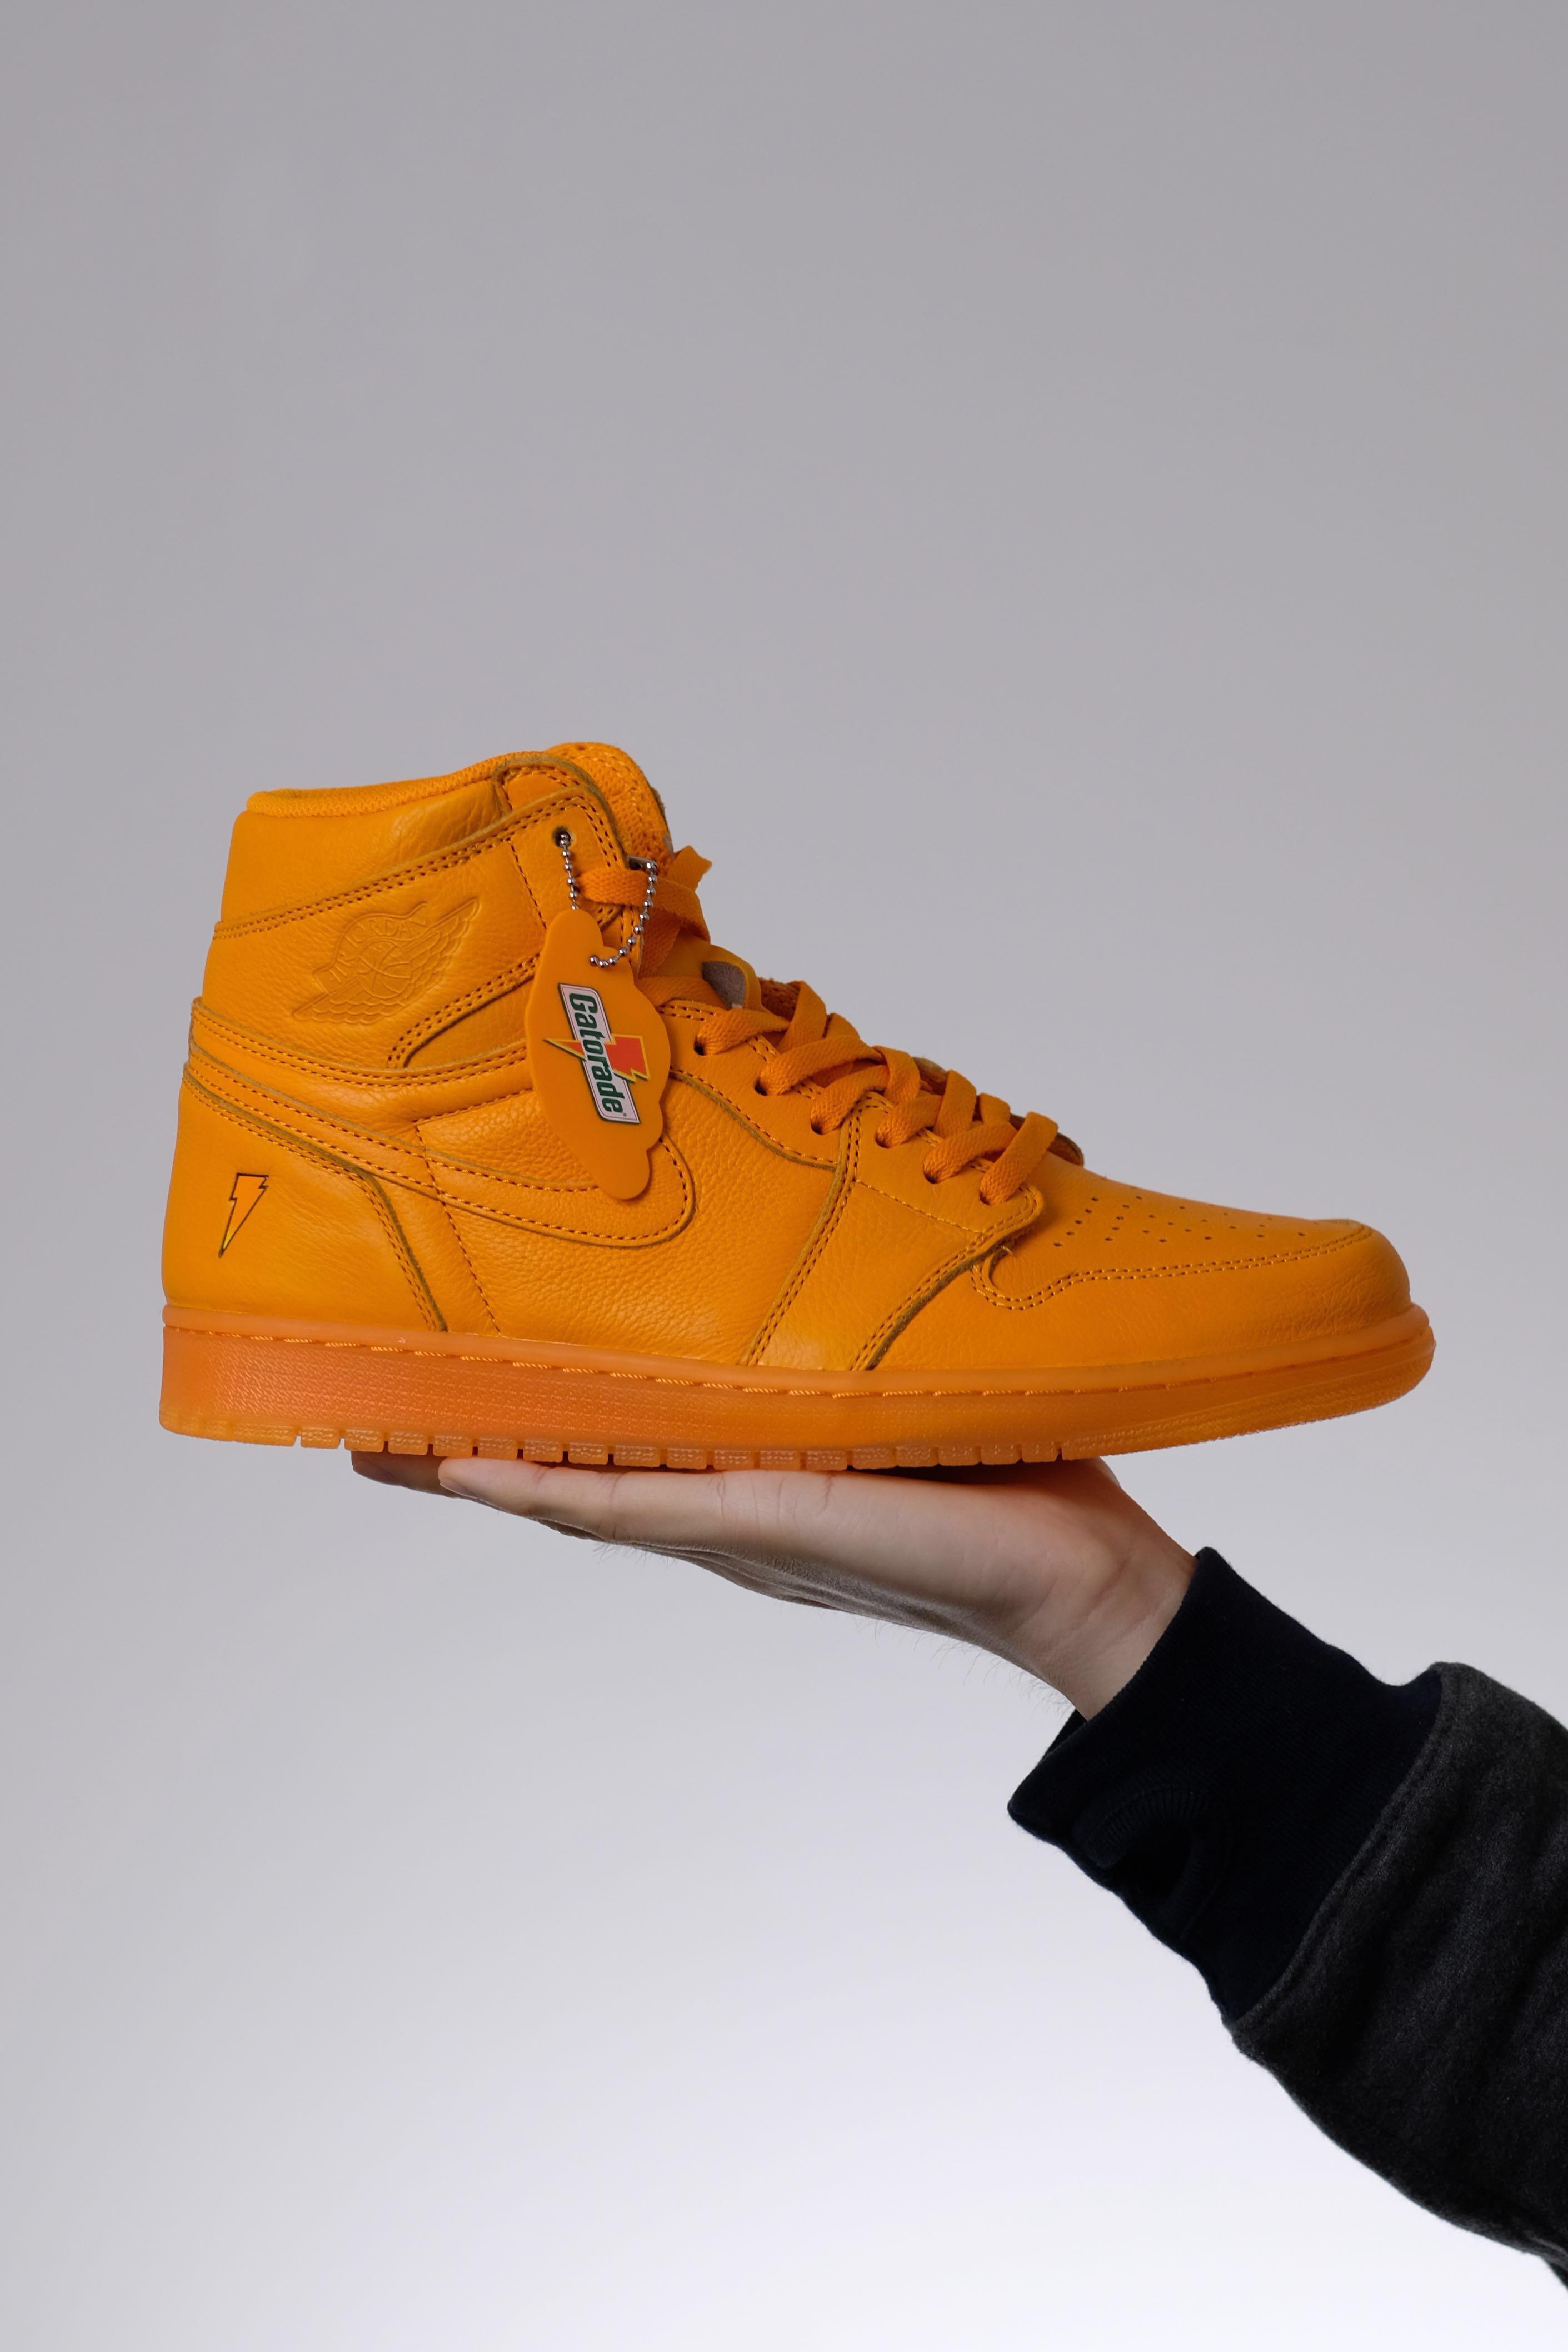 fd159a78526 Jordan 1 Gatorade Orange Peel US10.5, Men's Fashion, Footwear, Sneakers on  Carousell